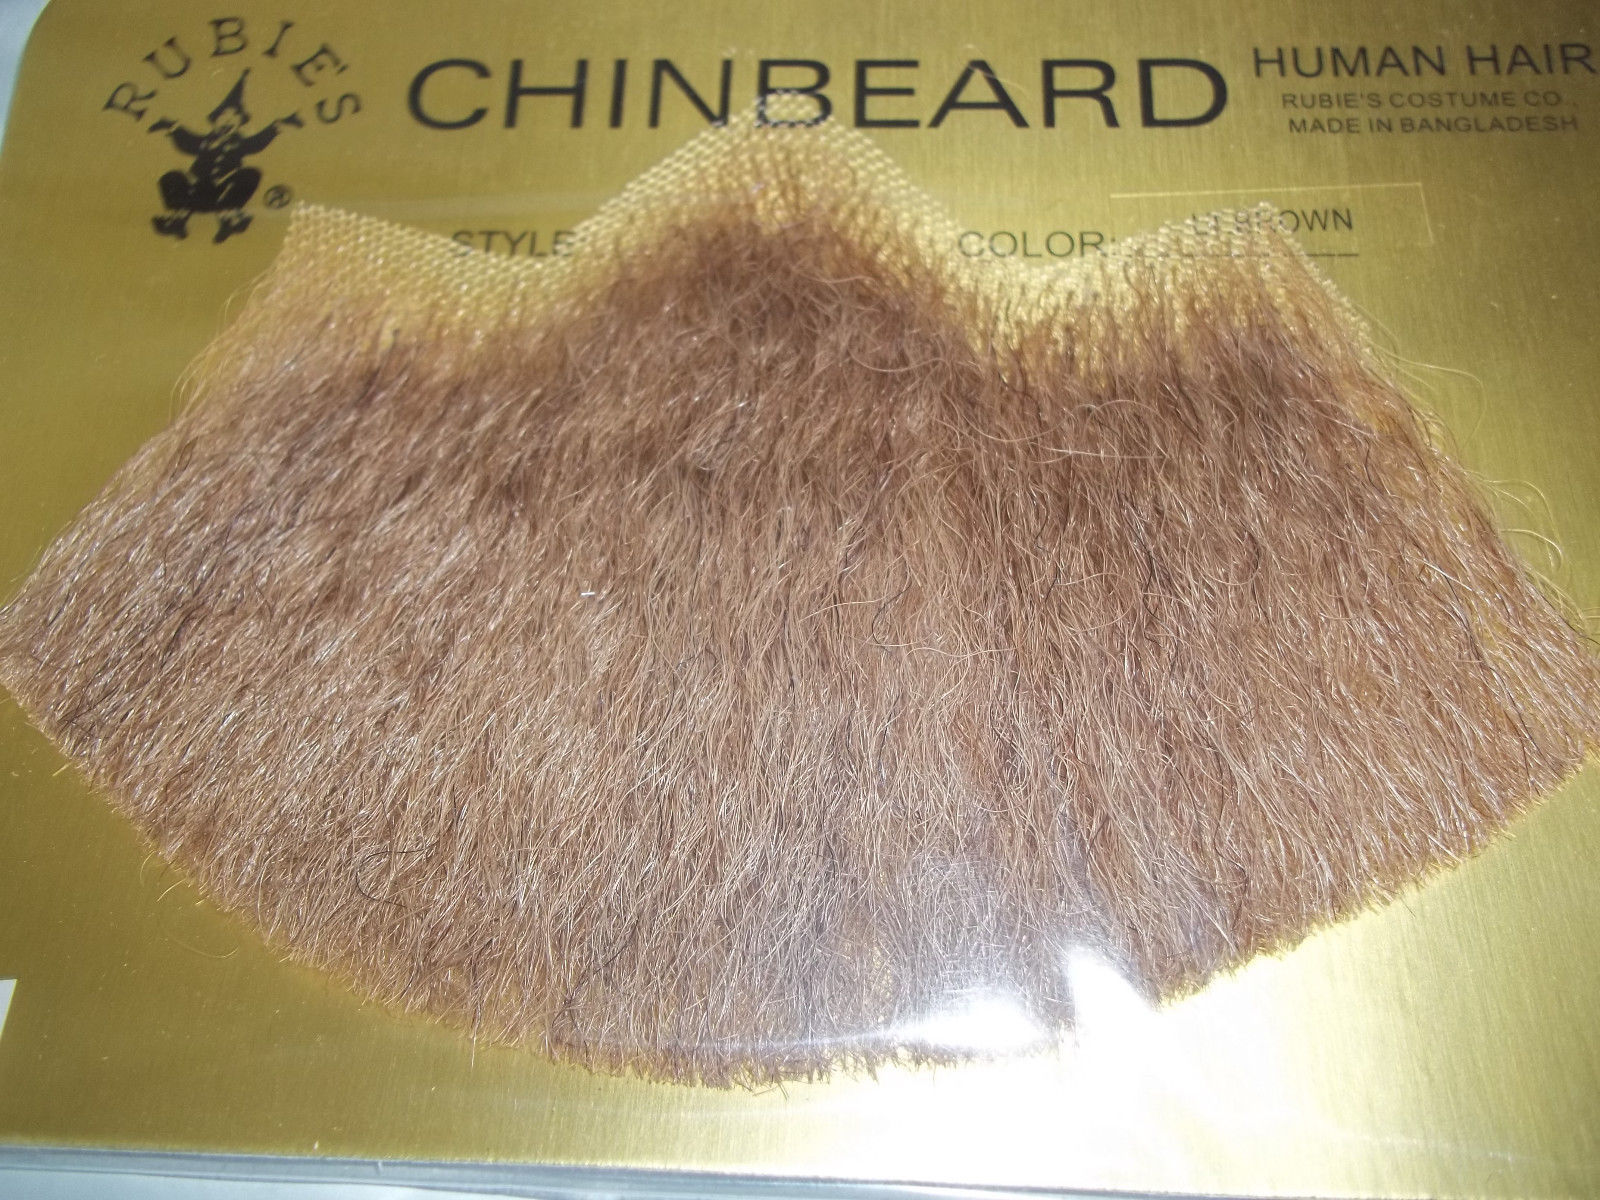 Dark Gray Human Hair Goatee Chin Beard Costume Beard 2022